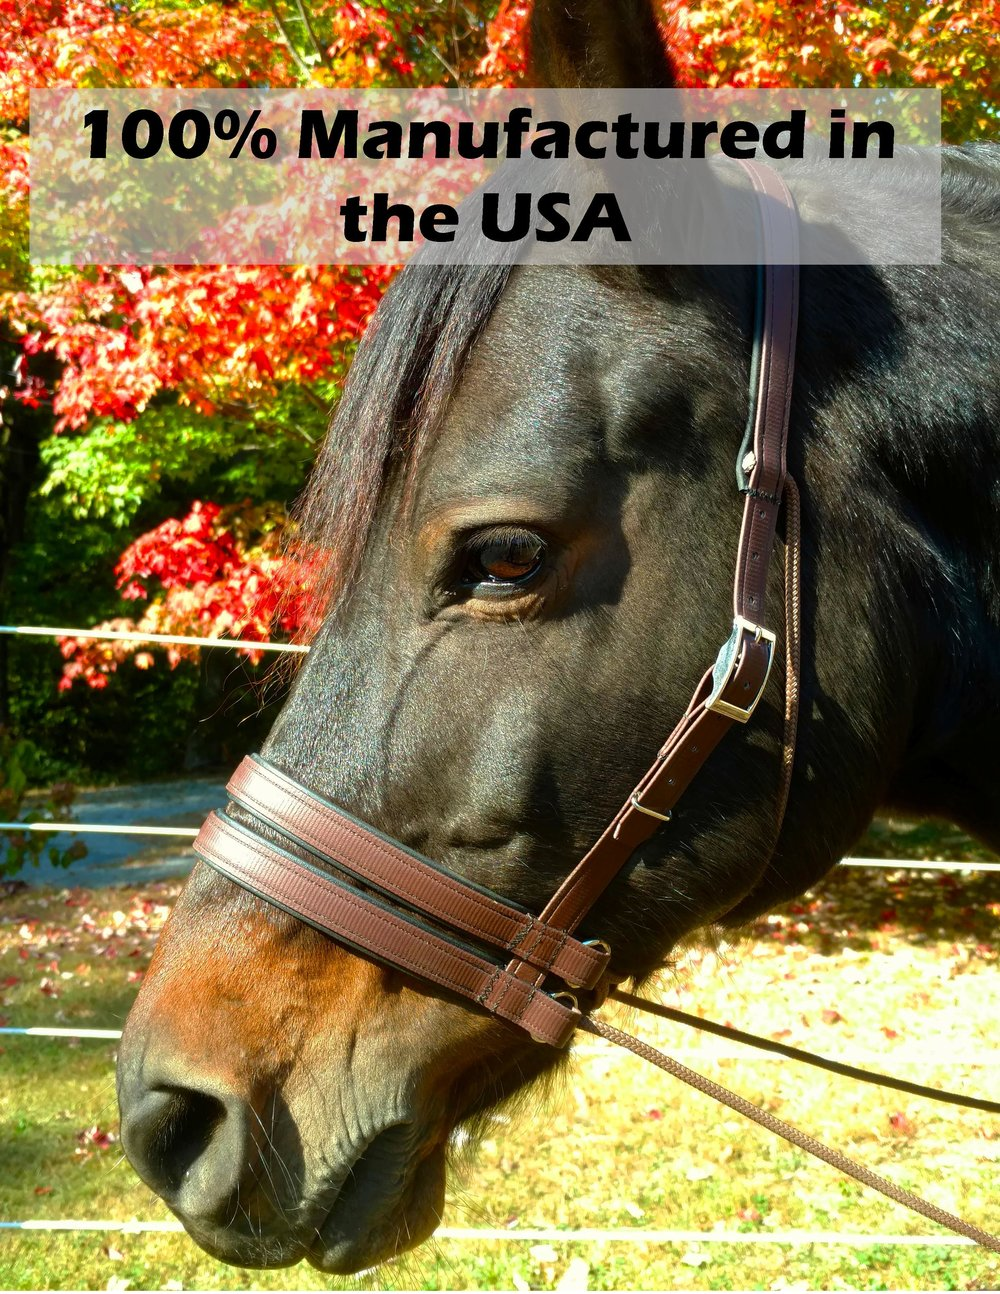 Manufactured USA.jpg